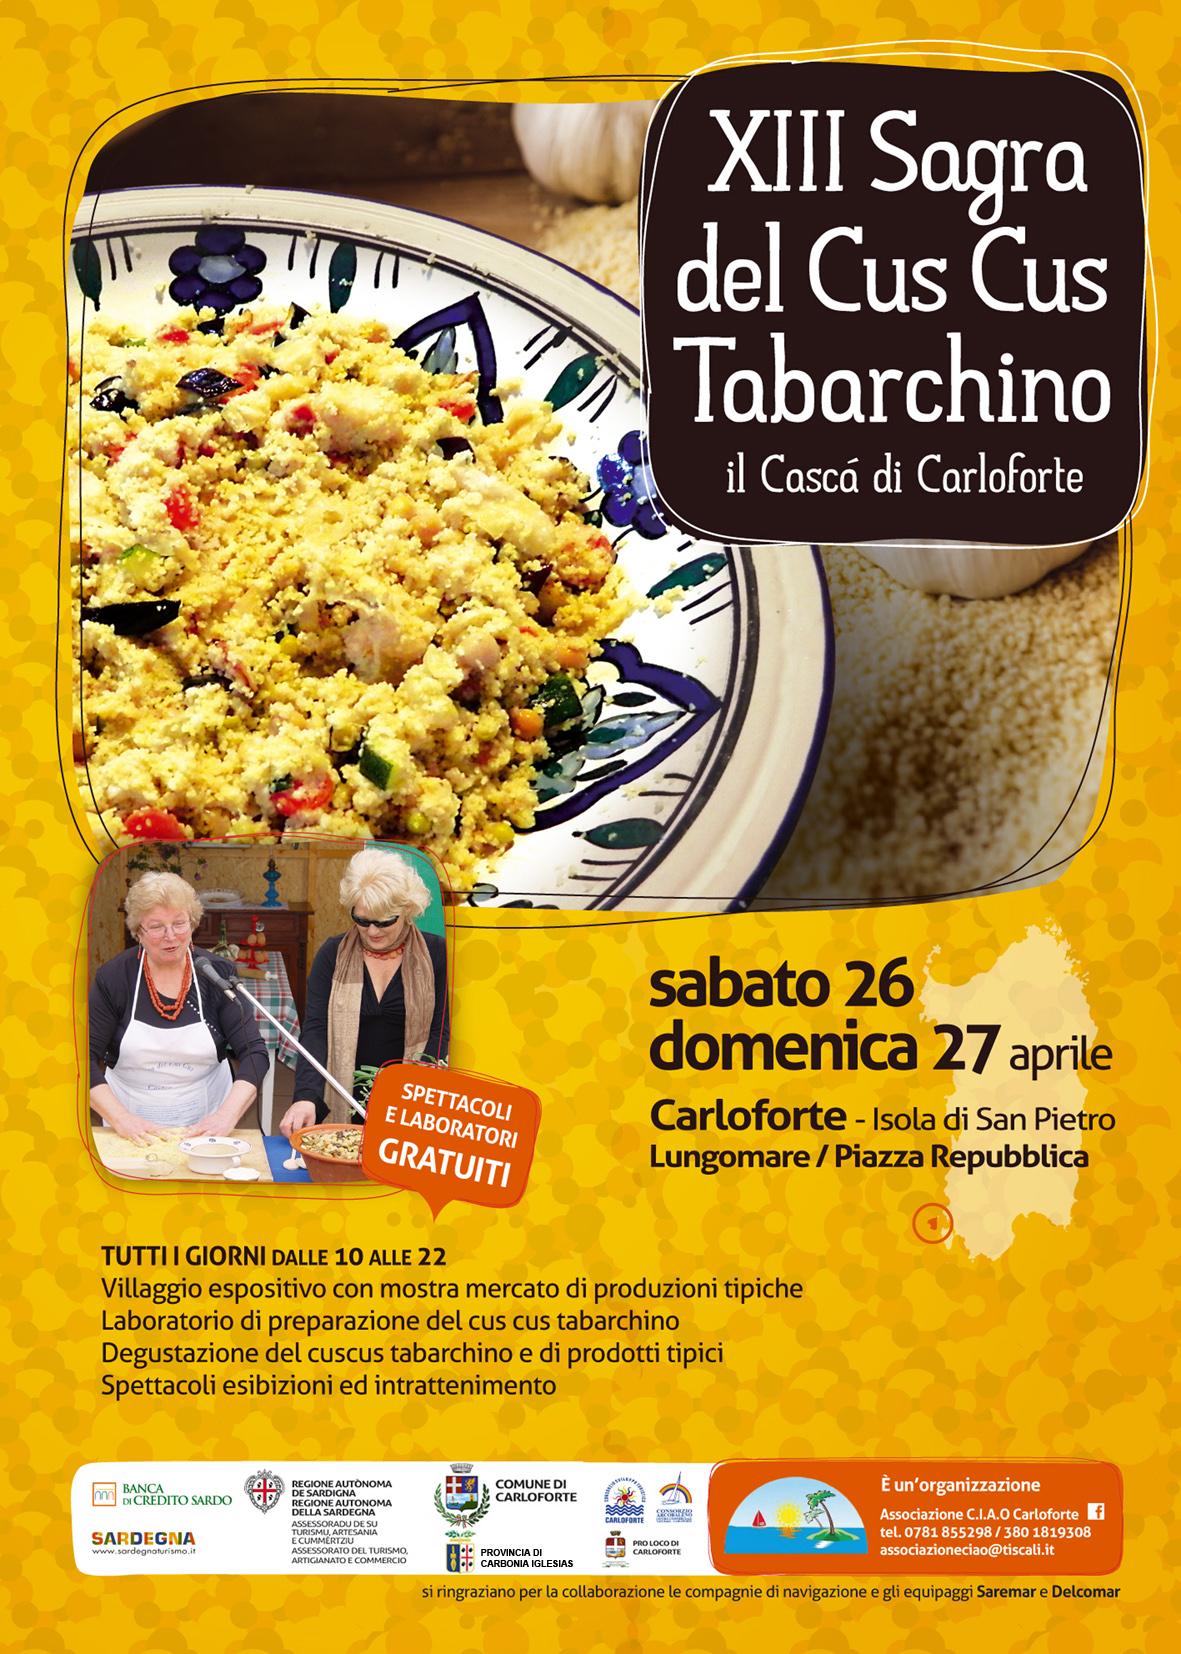 Locandina Sagra Cus Cus 2014 Carloforte